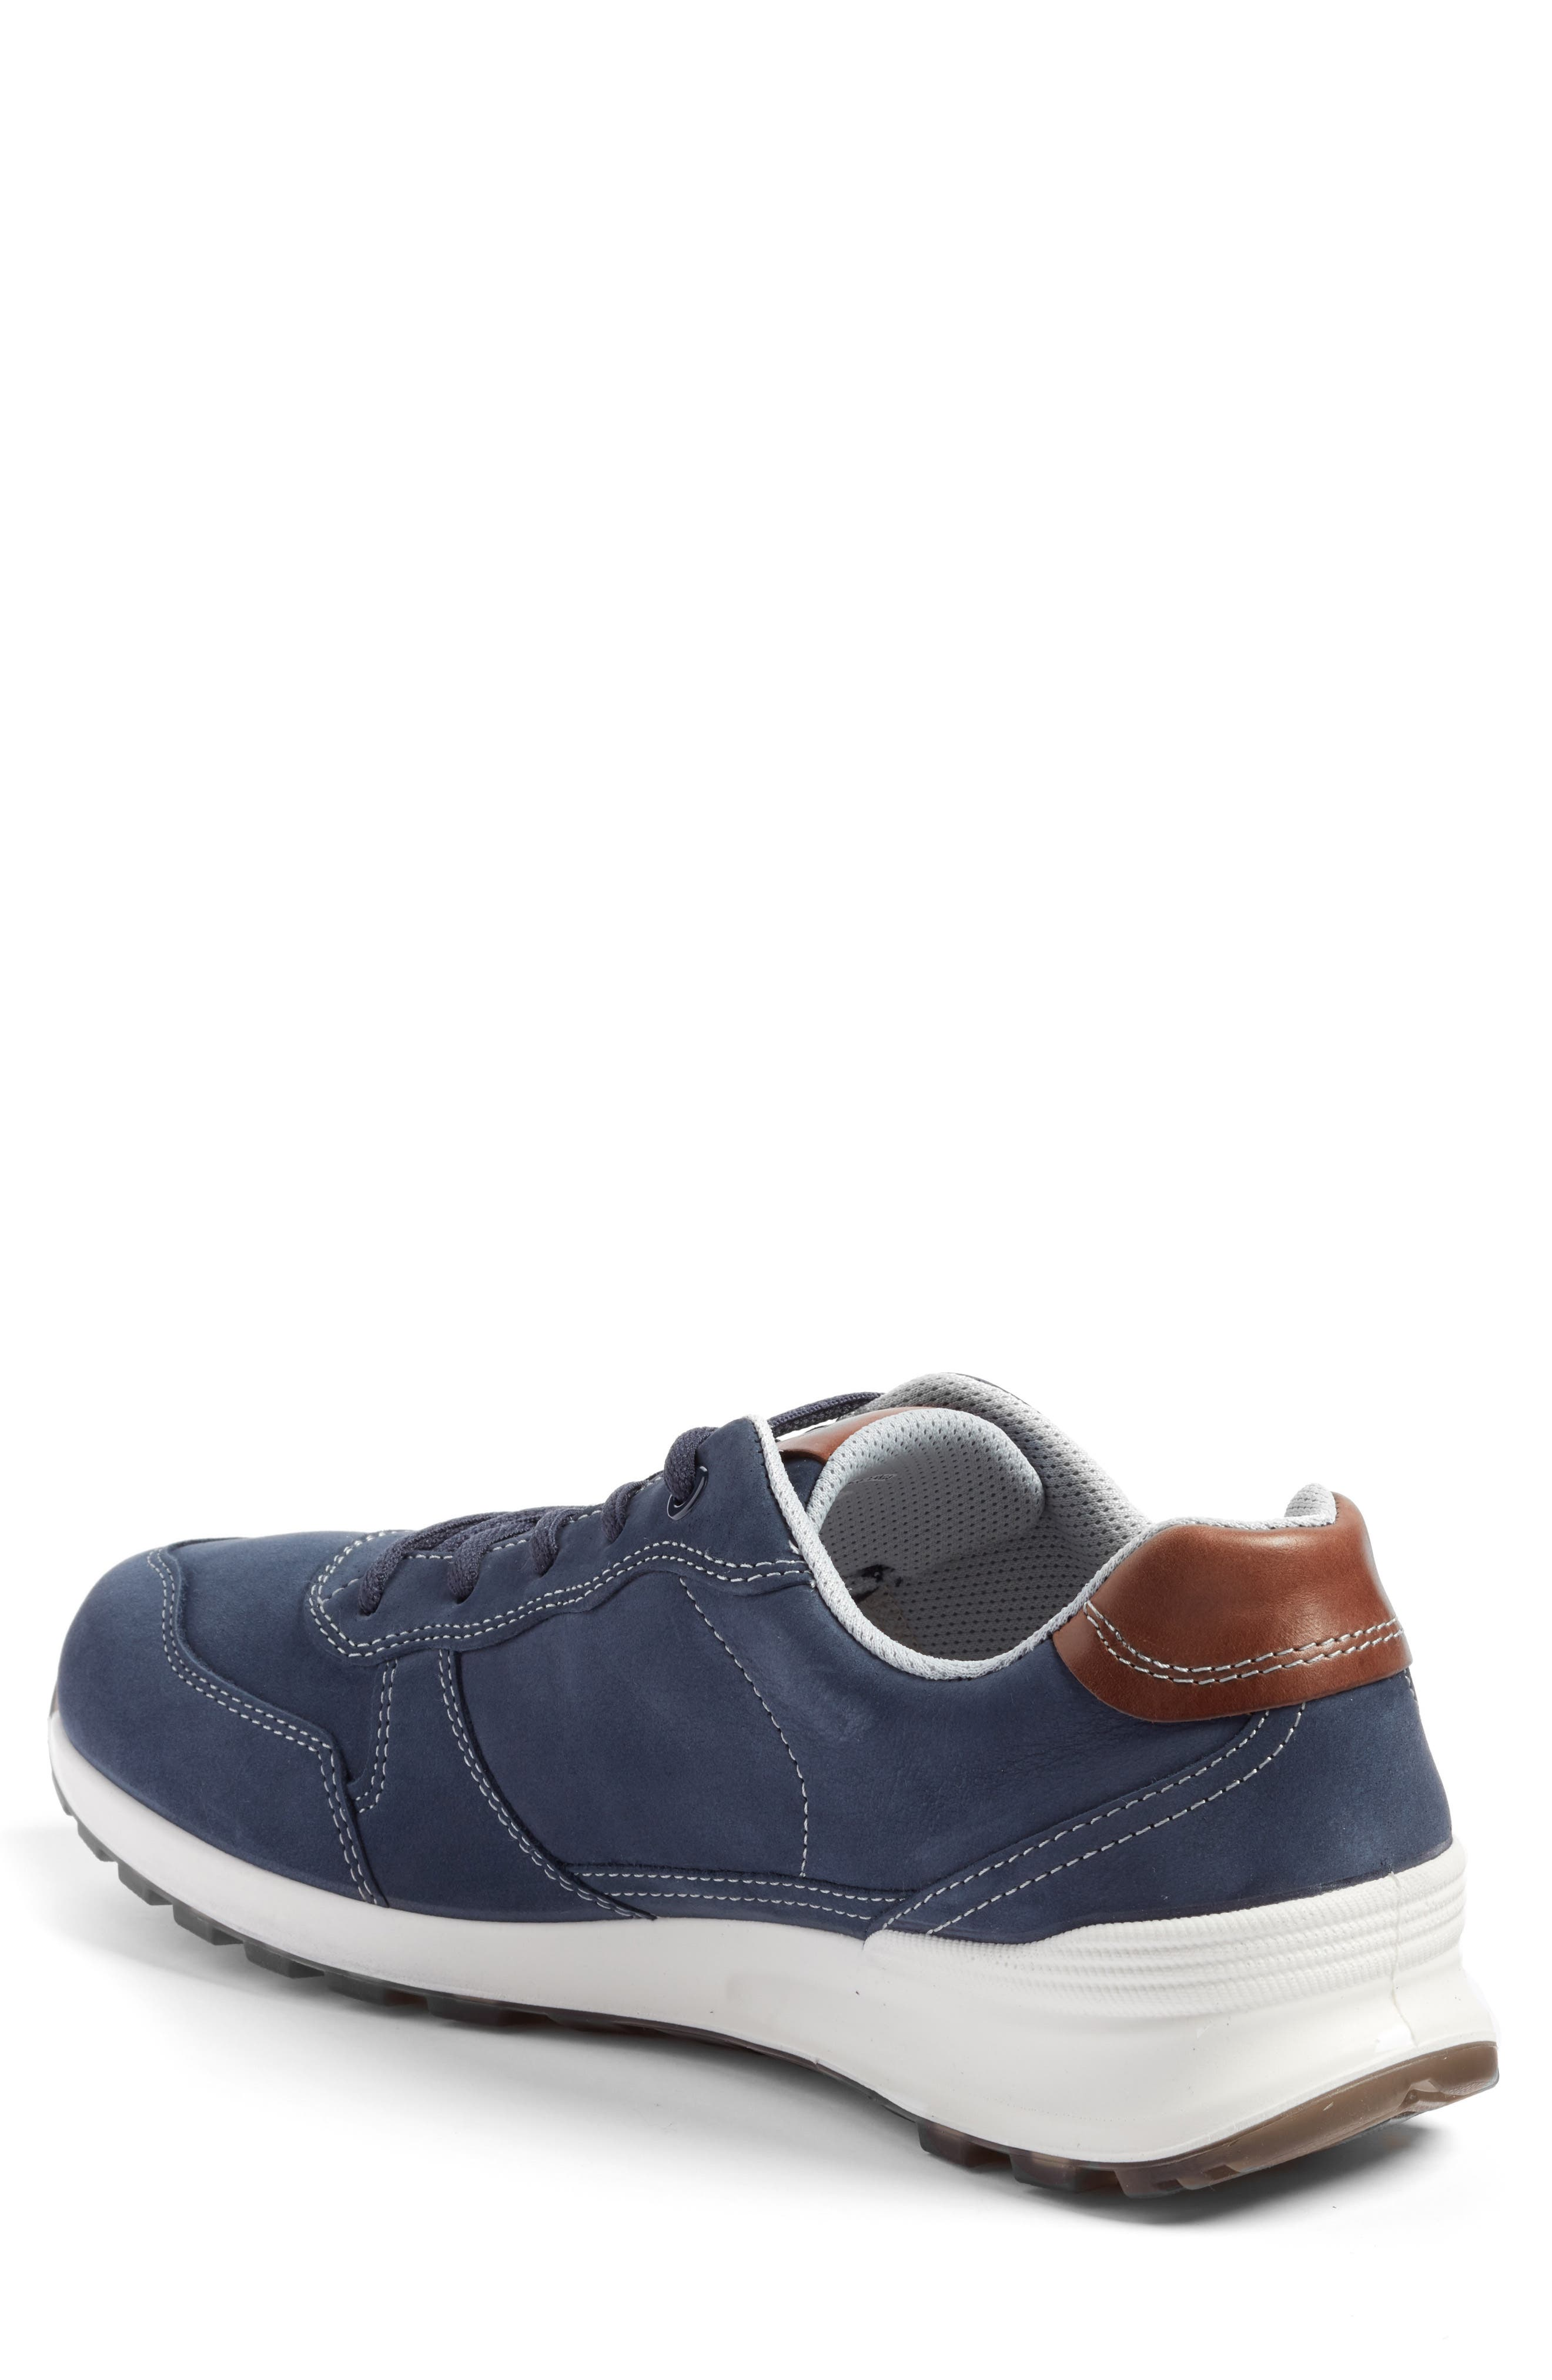 CS14 Retro Sneaker,                             Alternate thumbnail 2, color,                             408